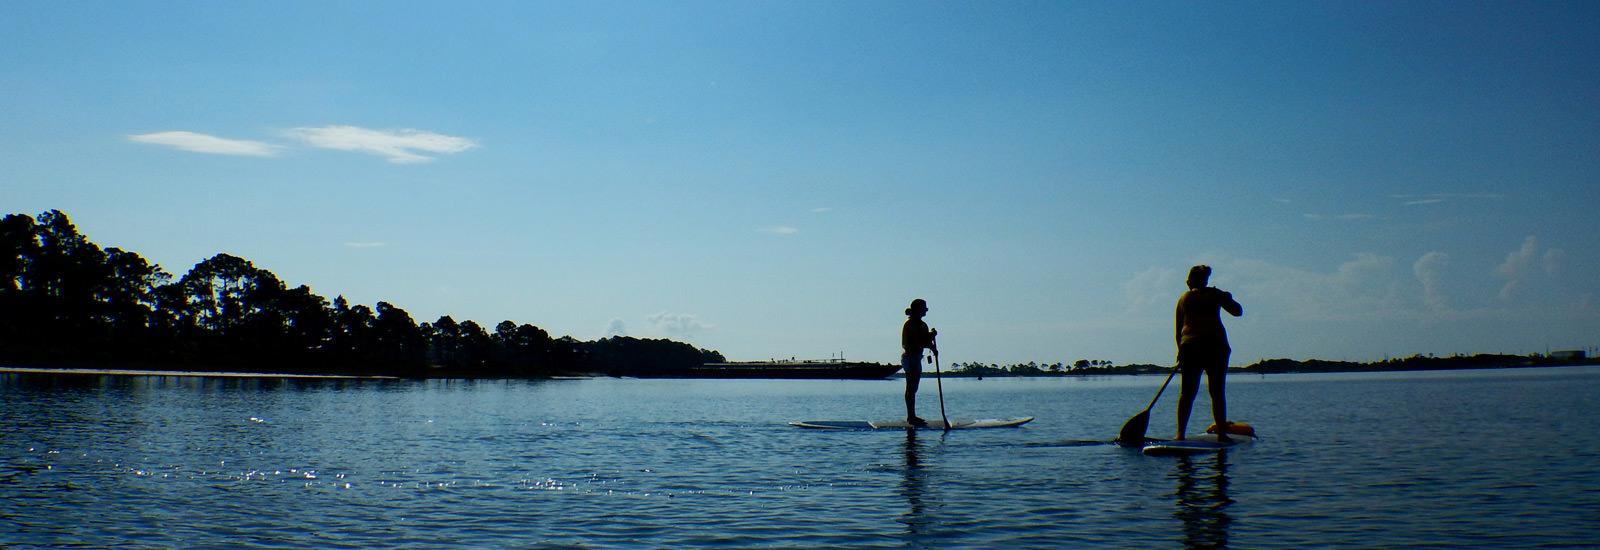 Stand up paddleboarding activity from Raithwaite Estate